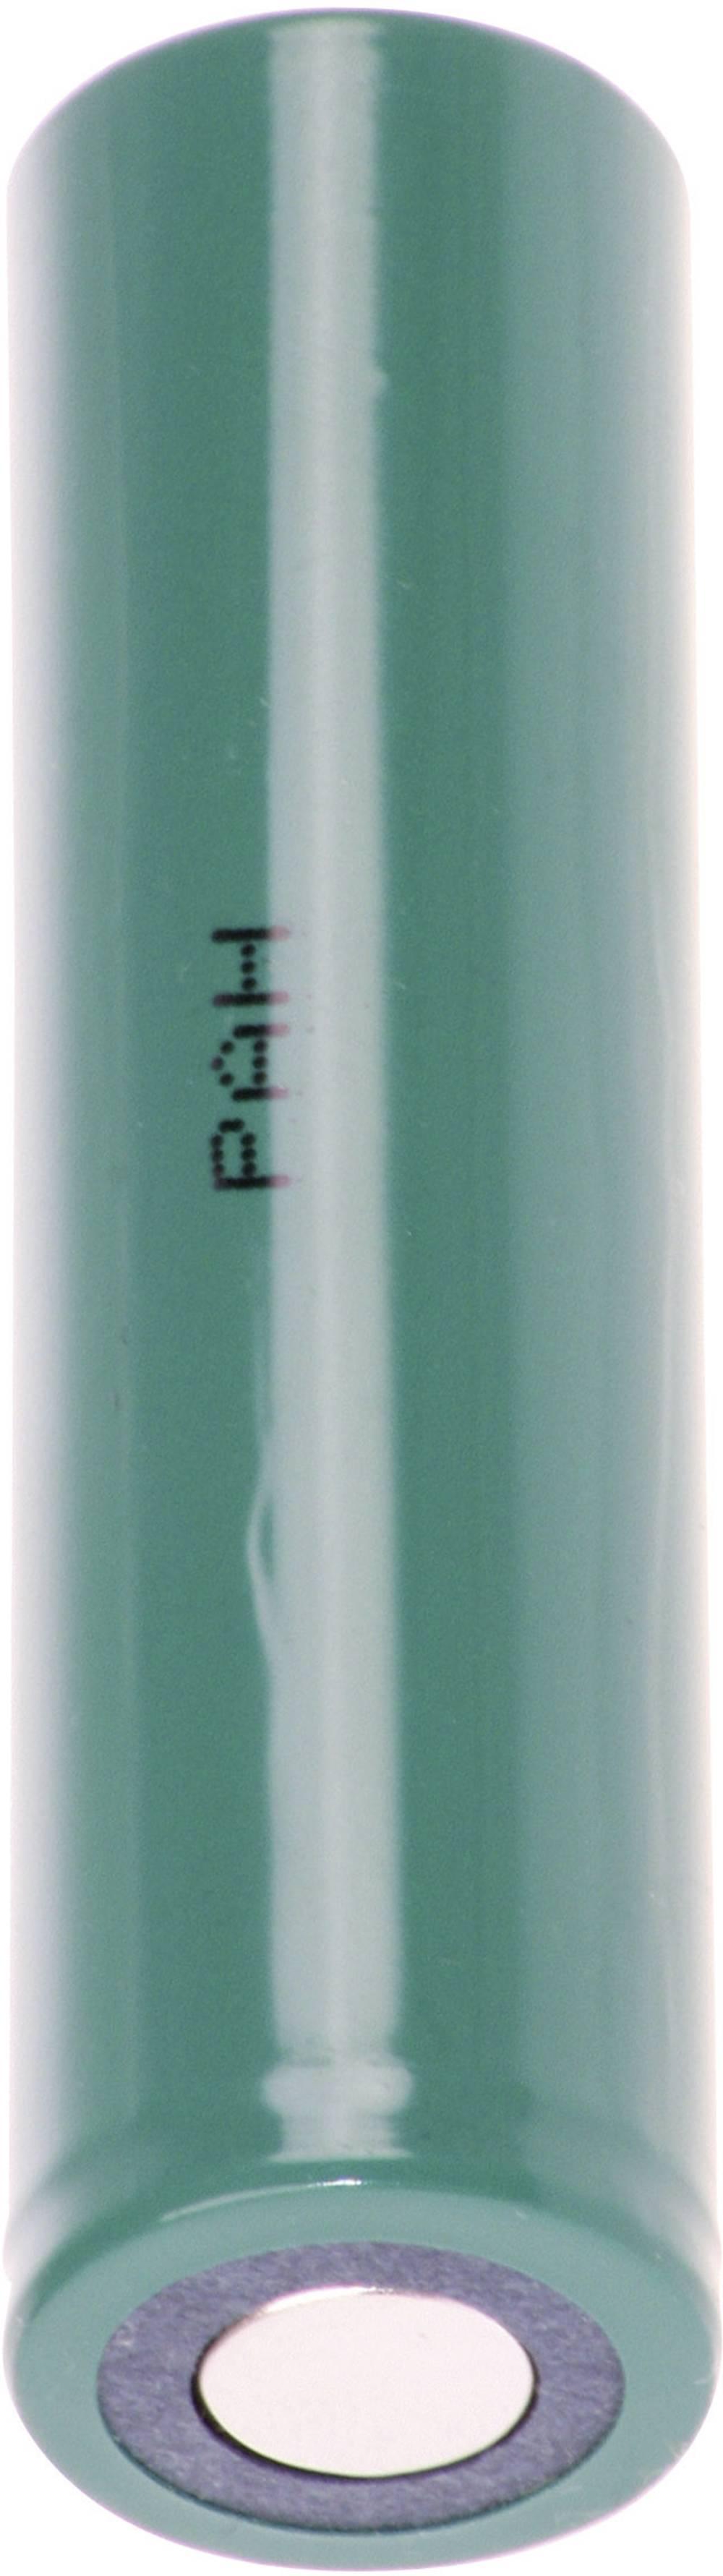 NiMH akumulator FDK 4/3 A HR-4/3FAU 1.2 V 4500 mAh (Ø x V) 18 mm x 67.5 mm